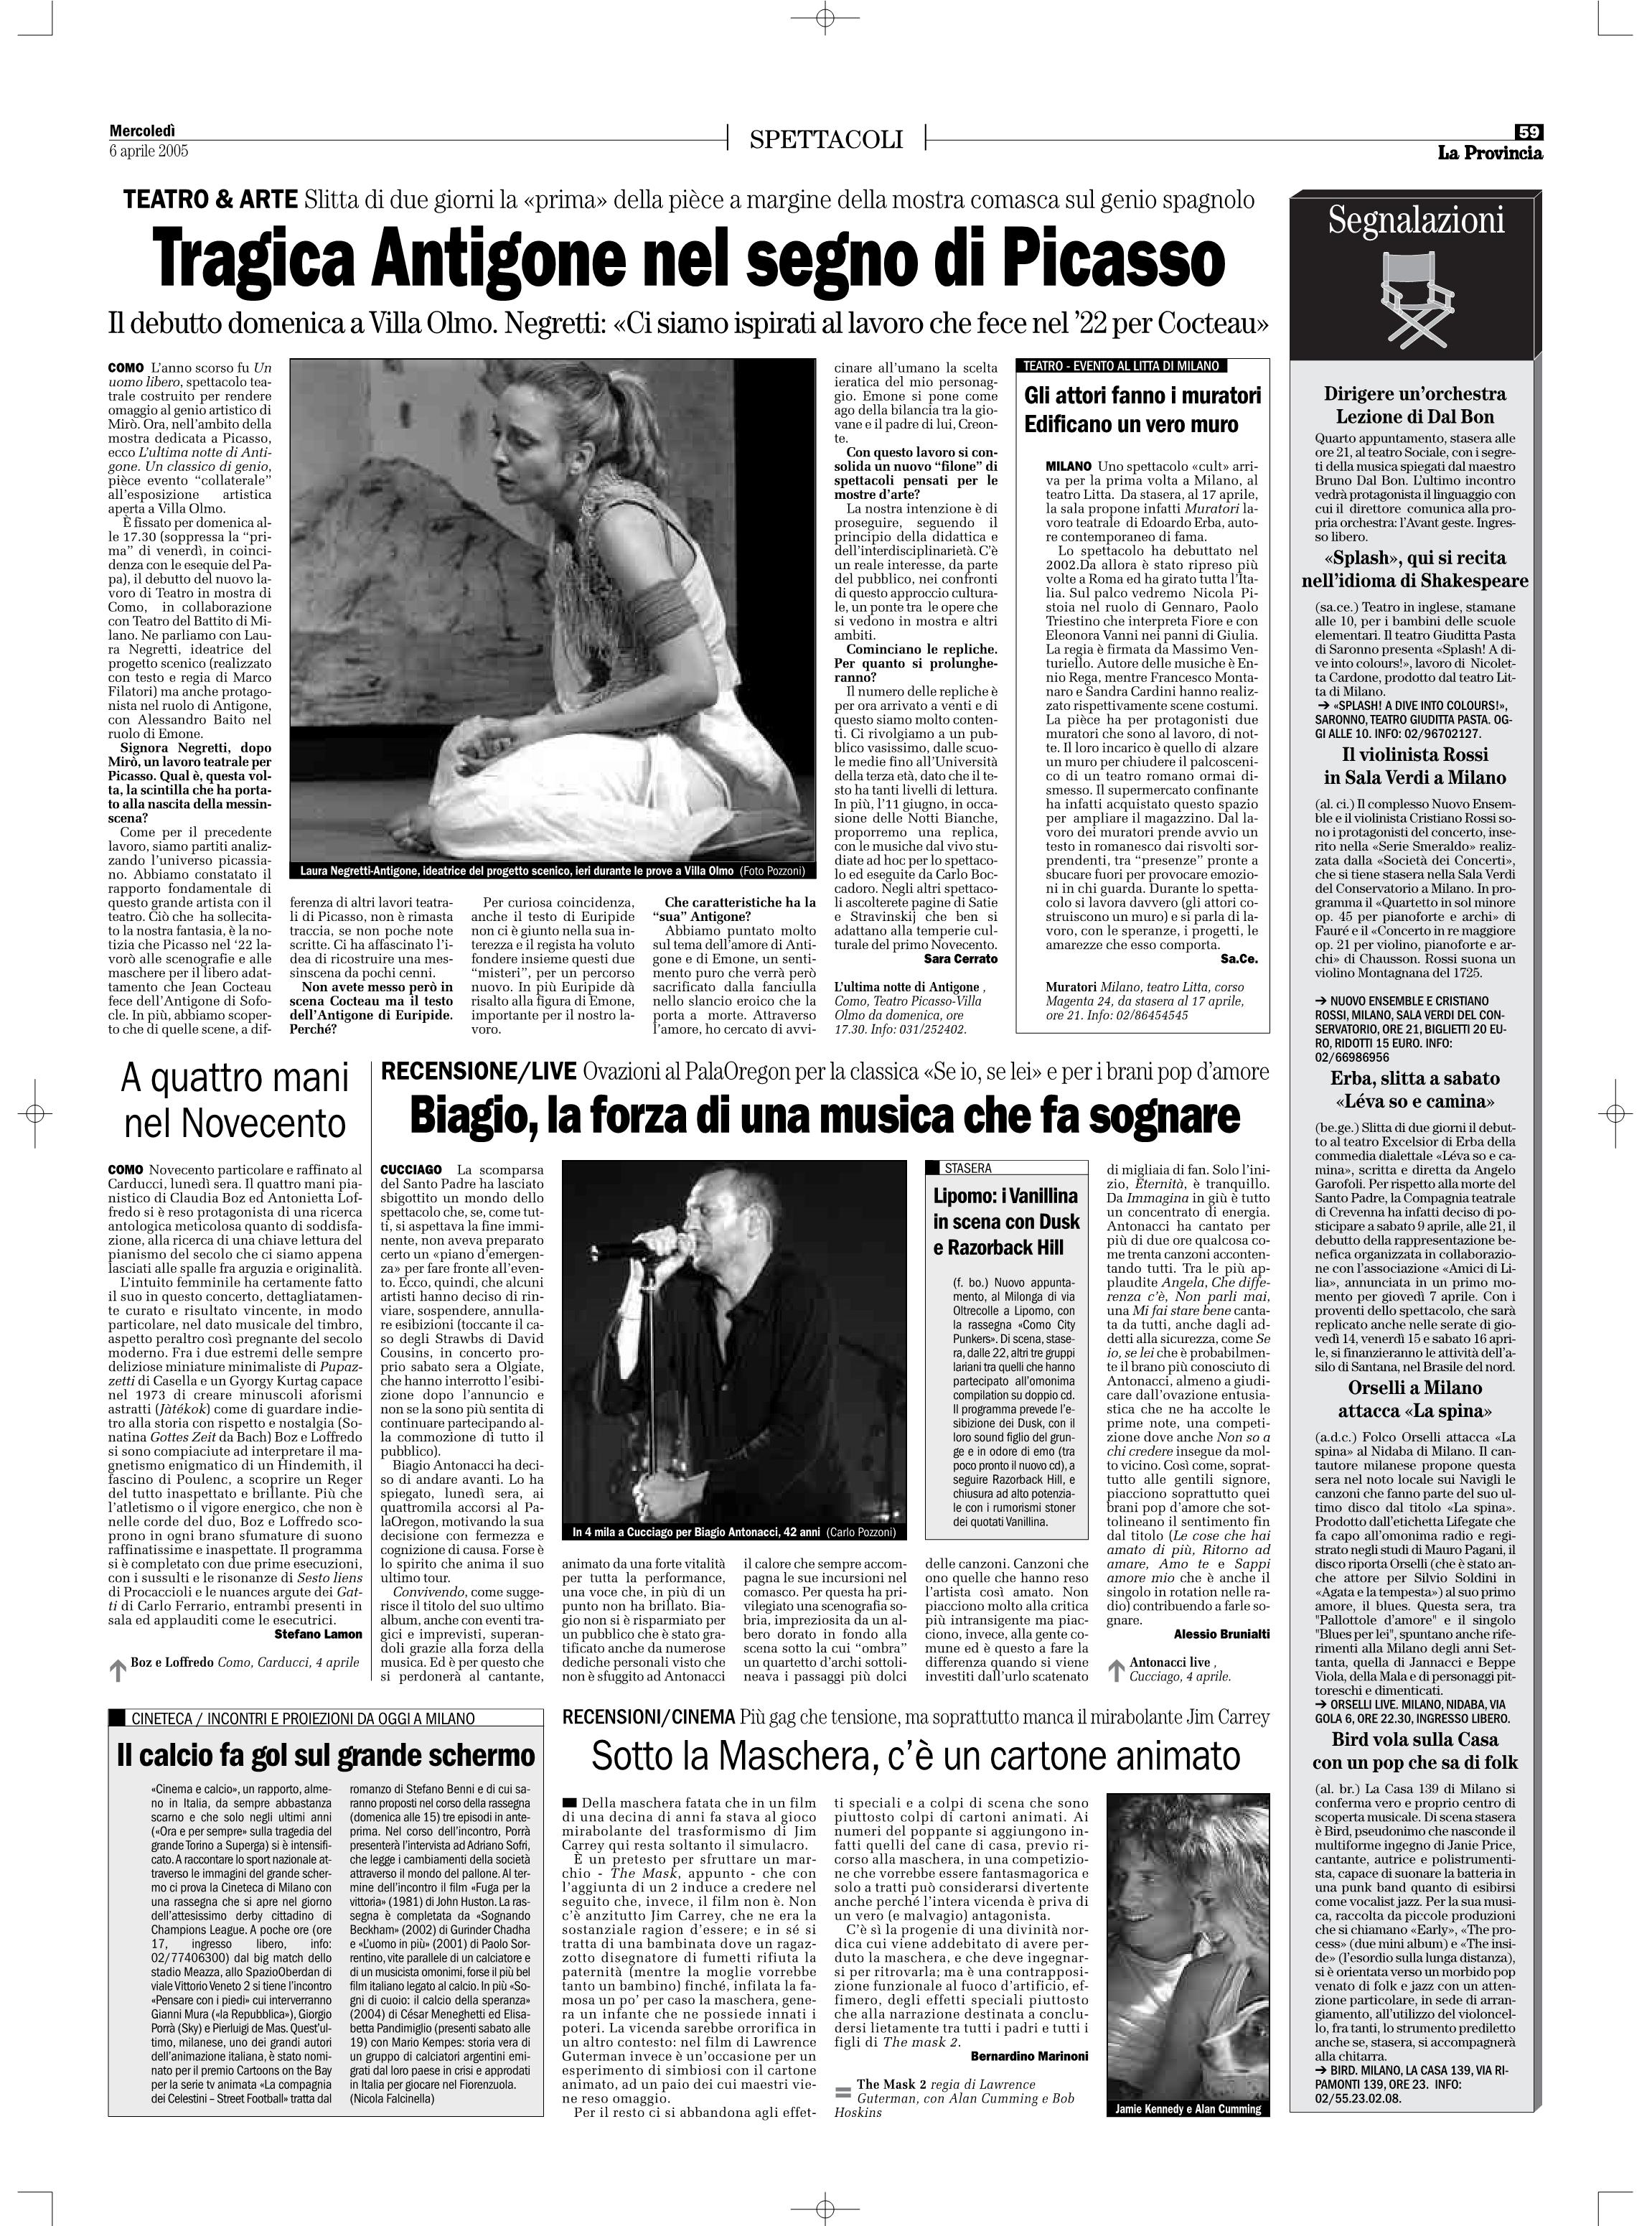 La Provincia 6 aprile 2005